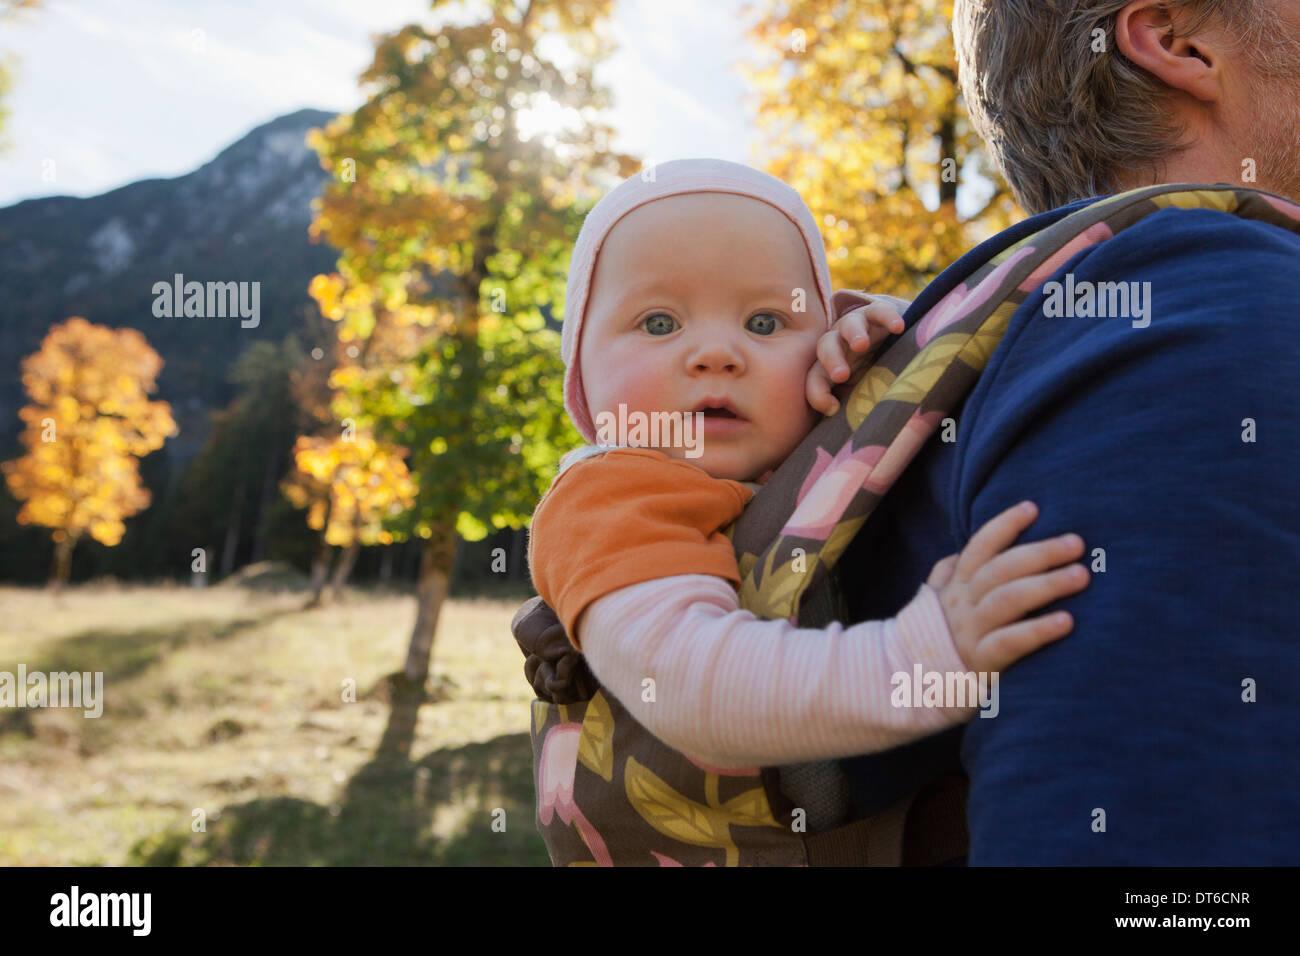 Vater mit Tochter in Träger Stockfoto